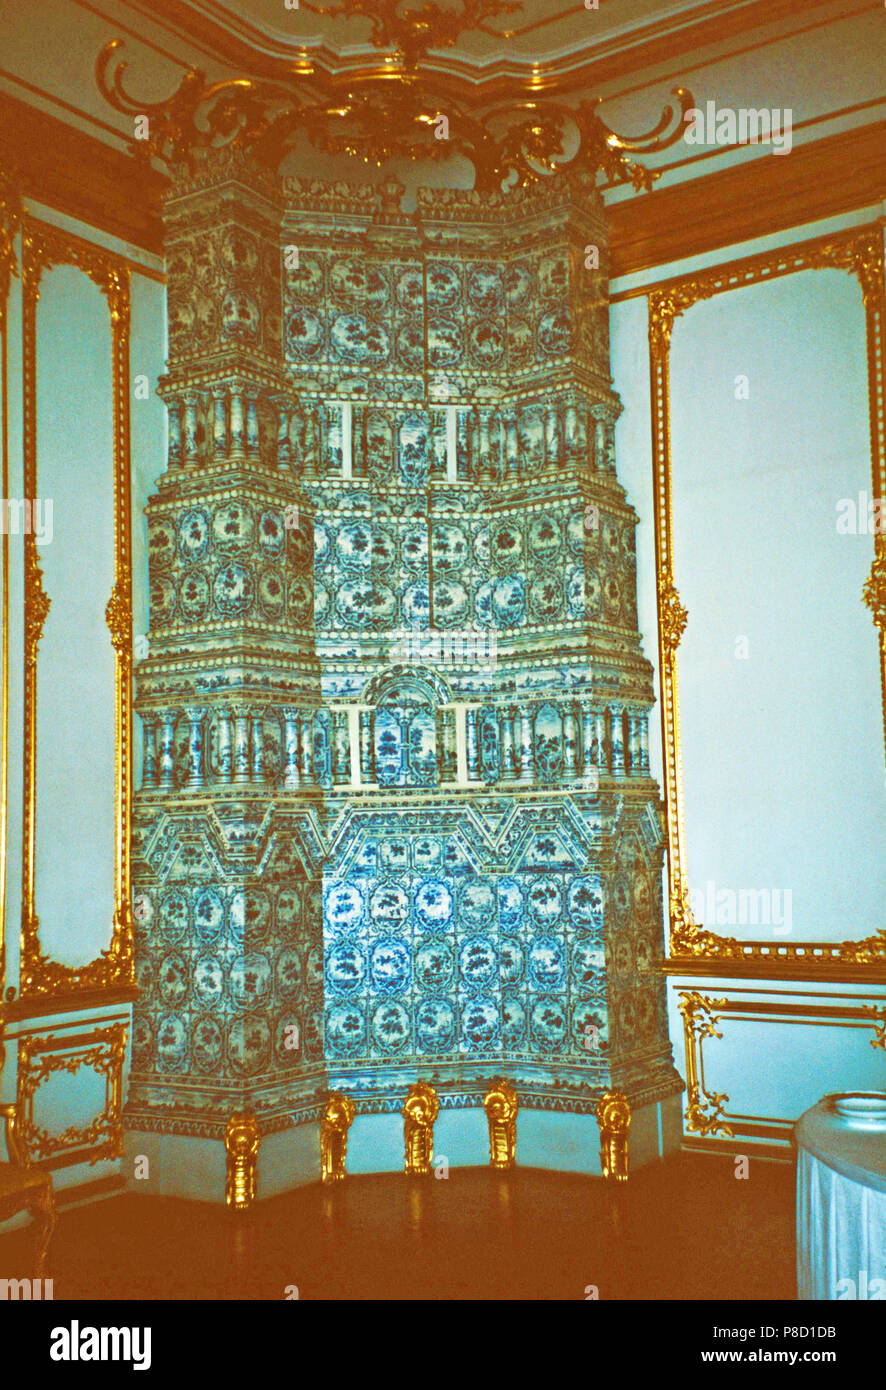 Porcelain tiled stove,Catherine Palace,Tsarkoe Selo,Russia - Stock Image